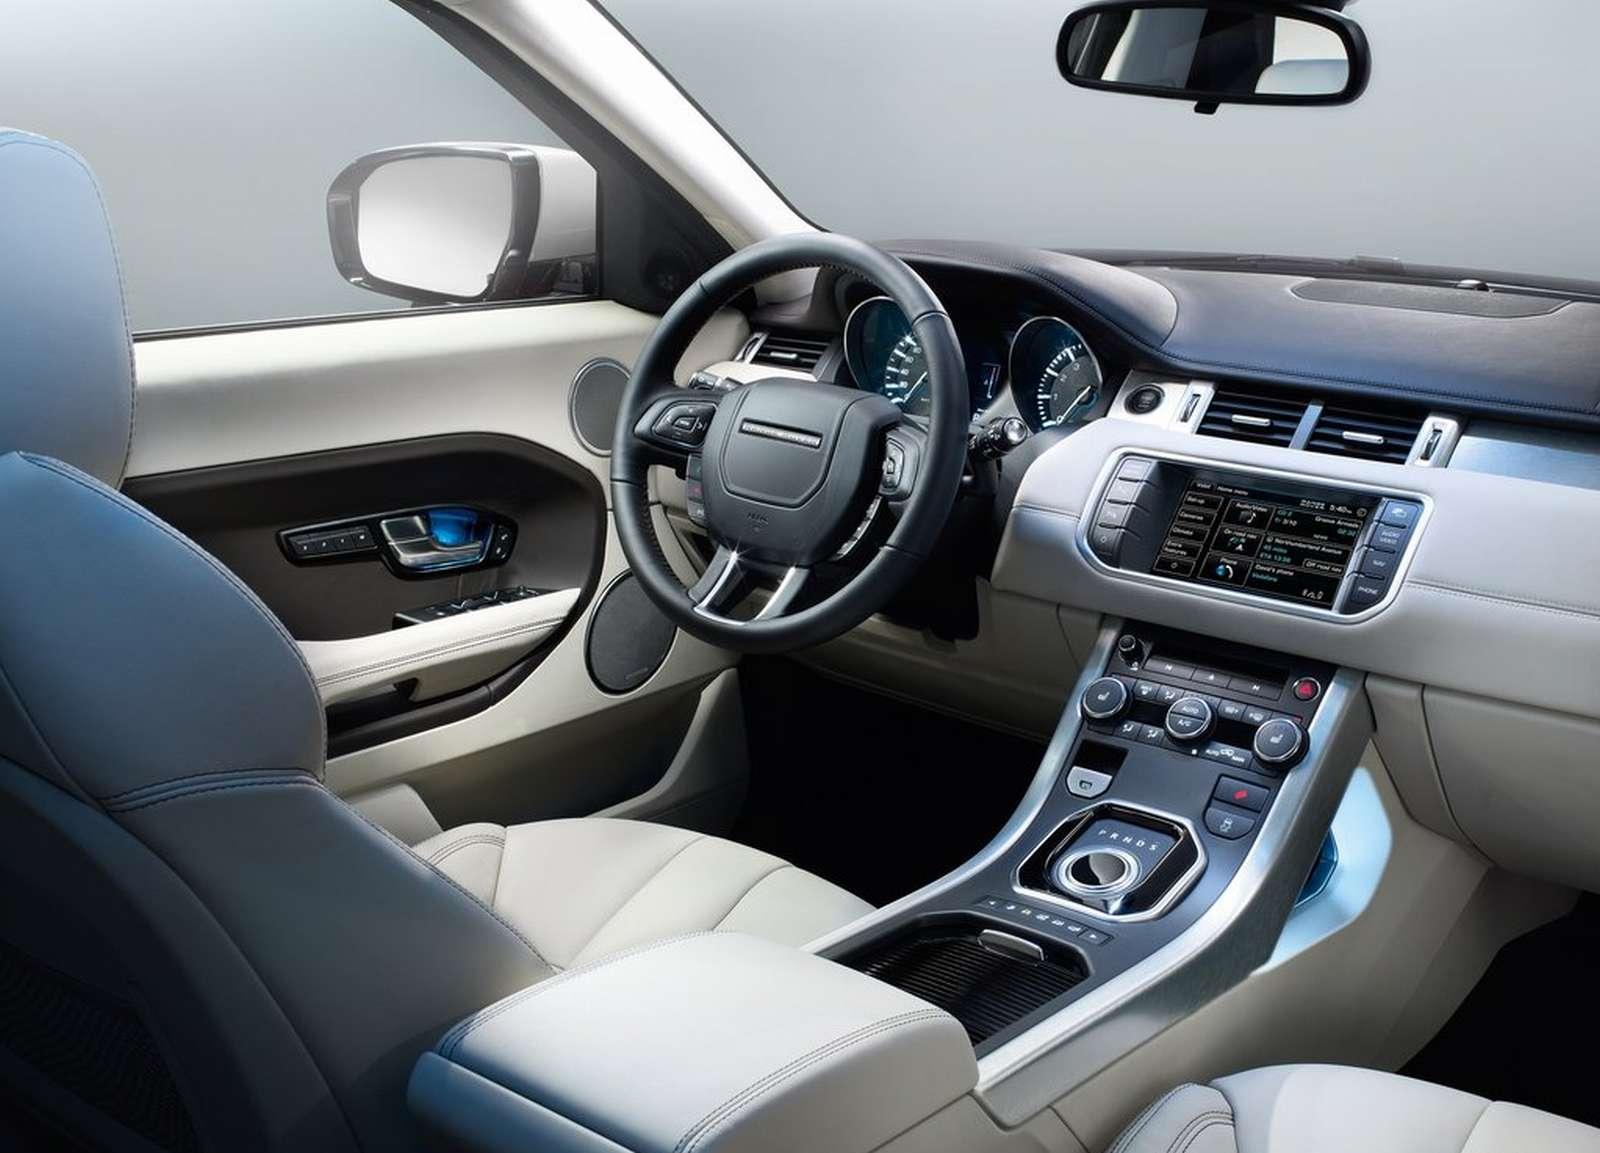 Automobiles tout savoir sur les marques rang rover evoque for Interieur range rover evoque